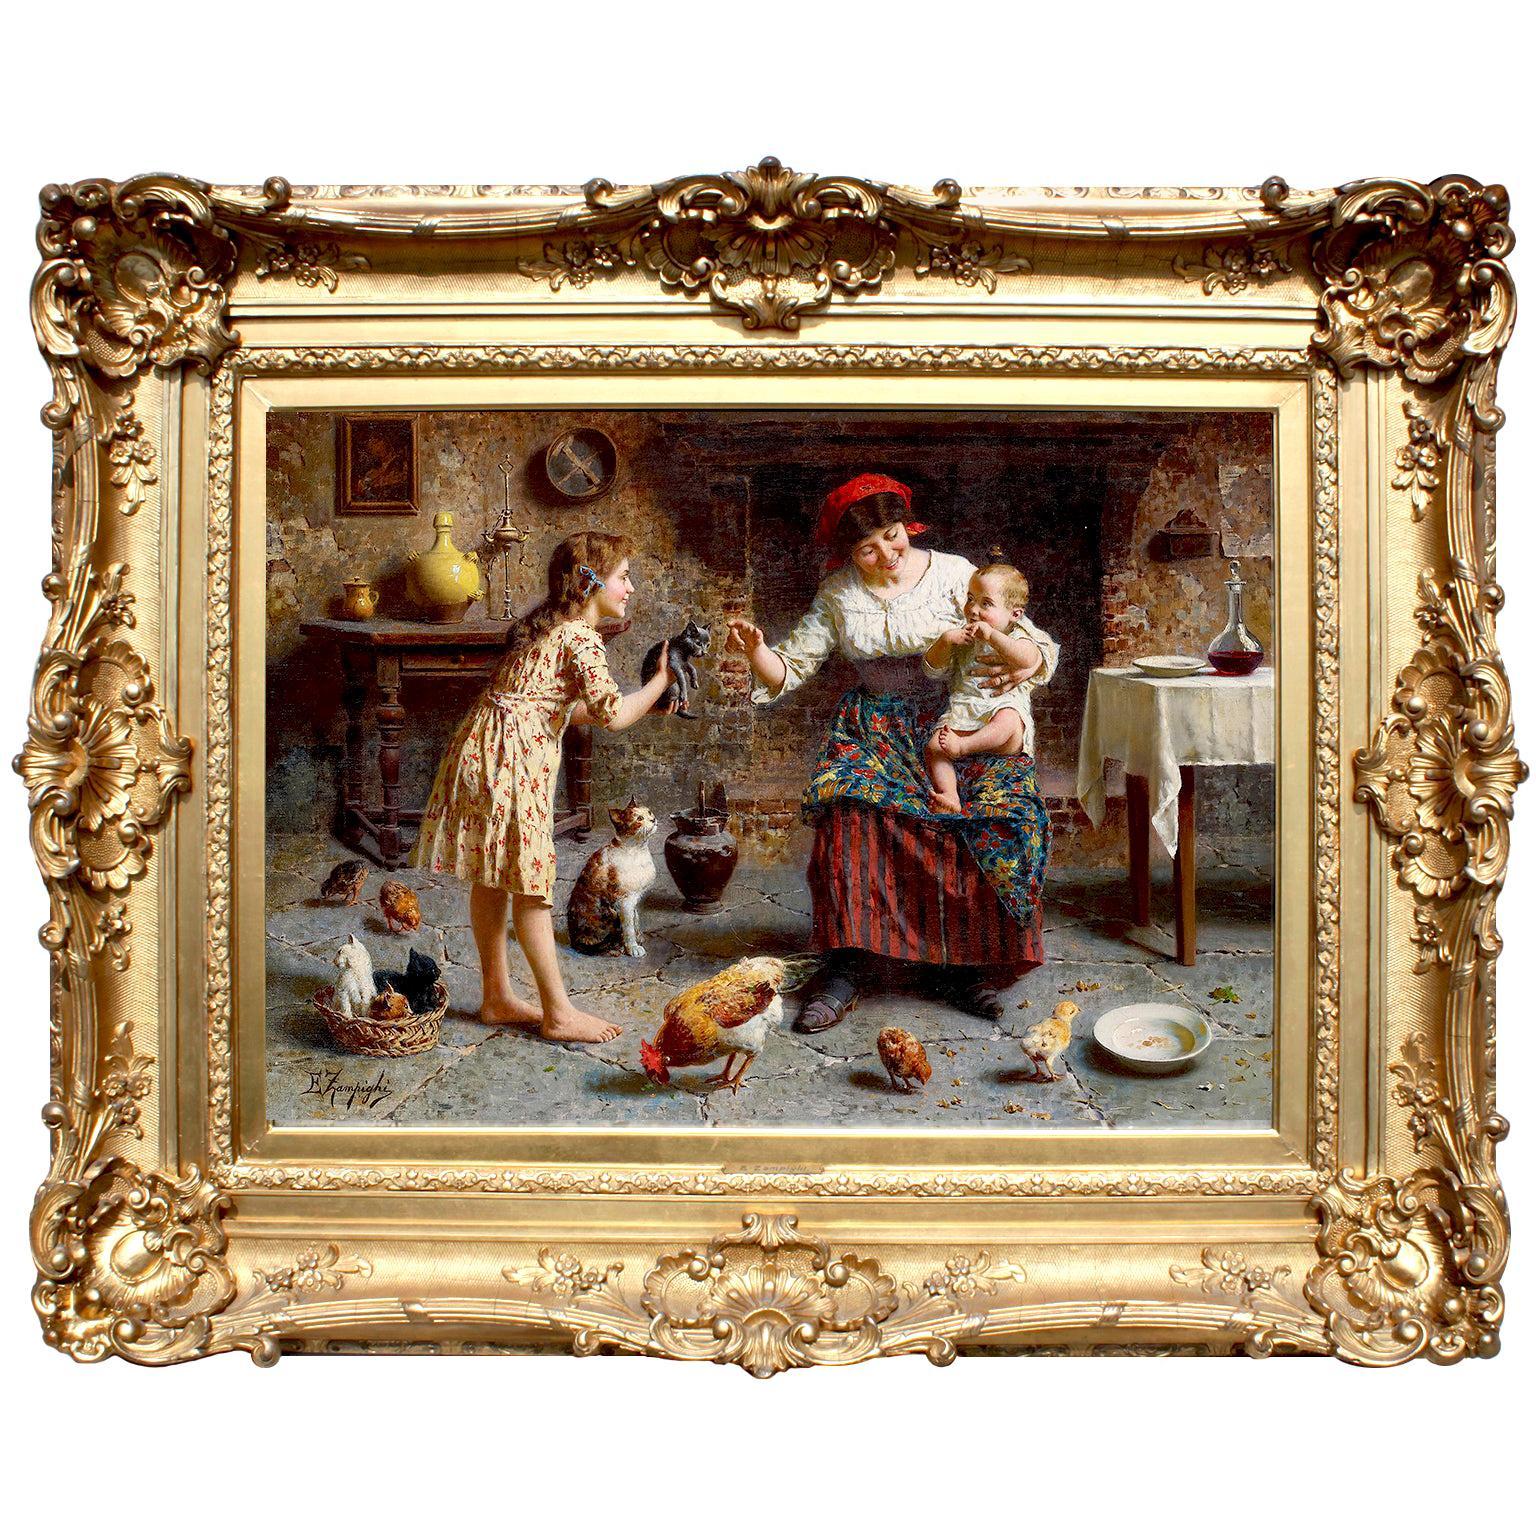 "Eugenio Zampighi 'Italian, 1859-1944' 19th/20th C. Oil on Canvas ""Joyous Family"""